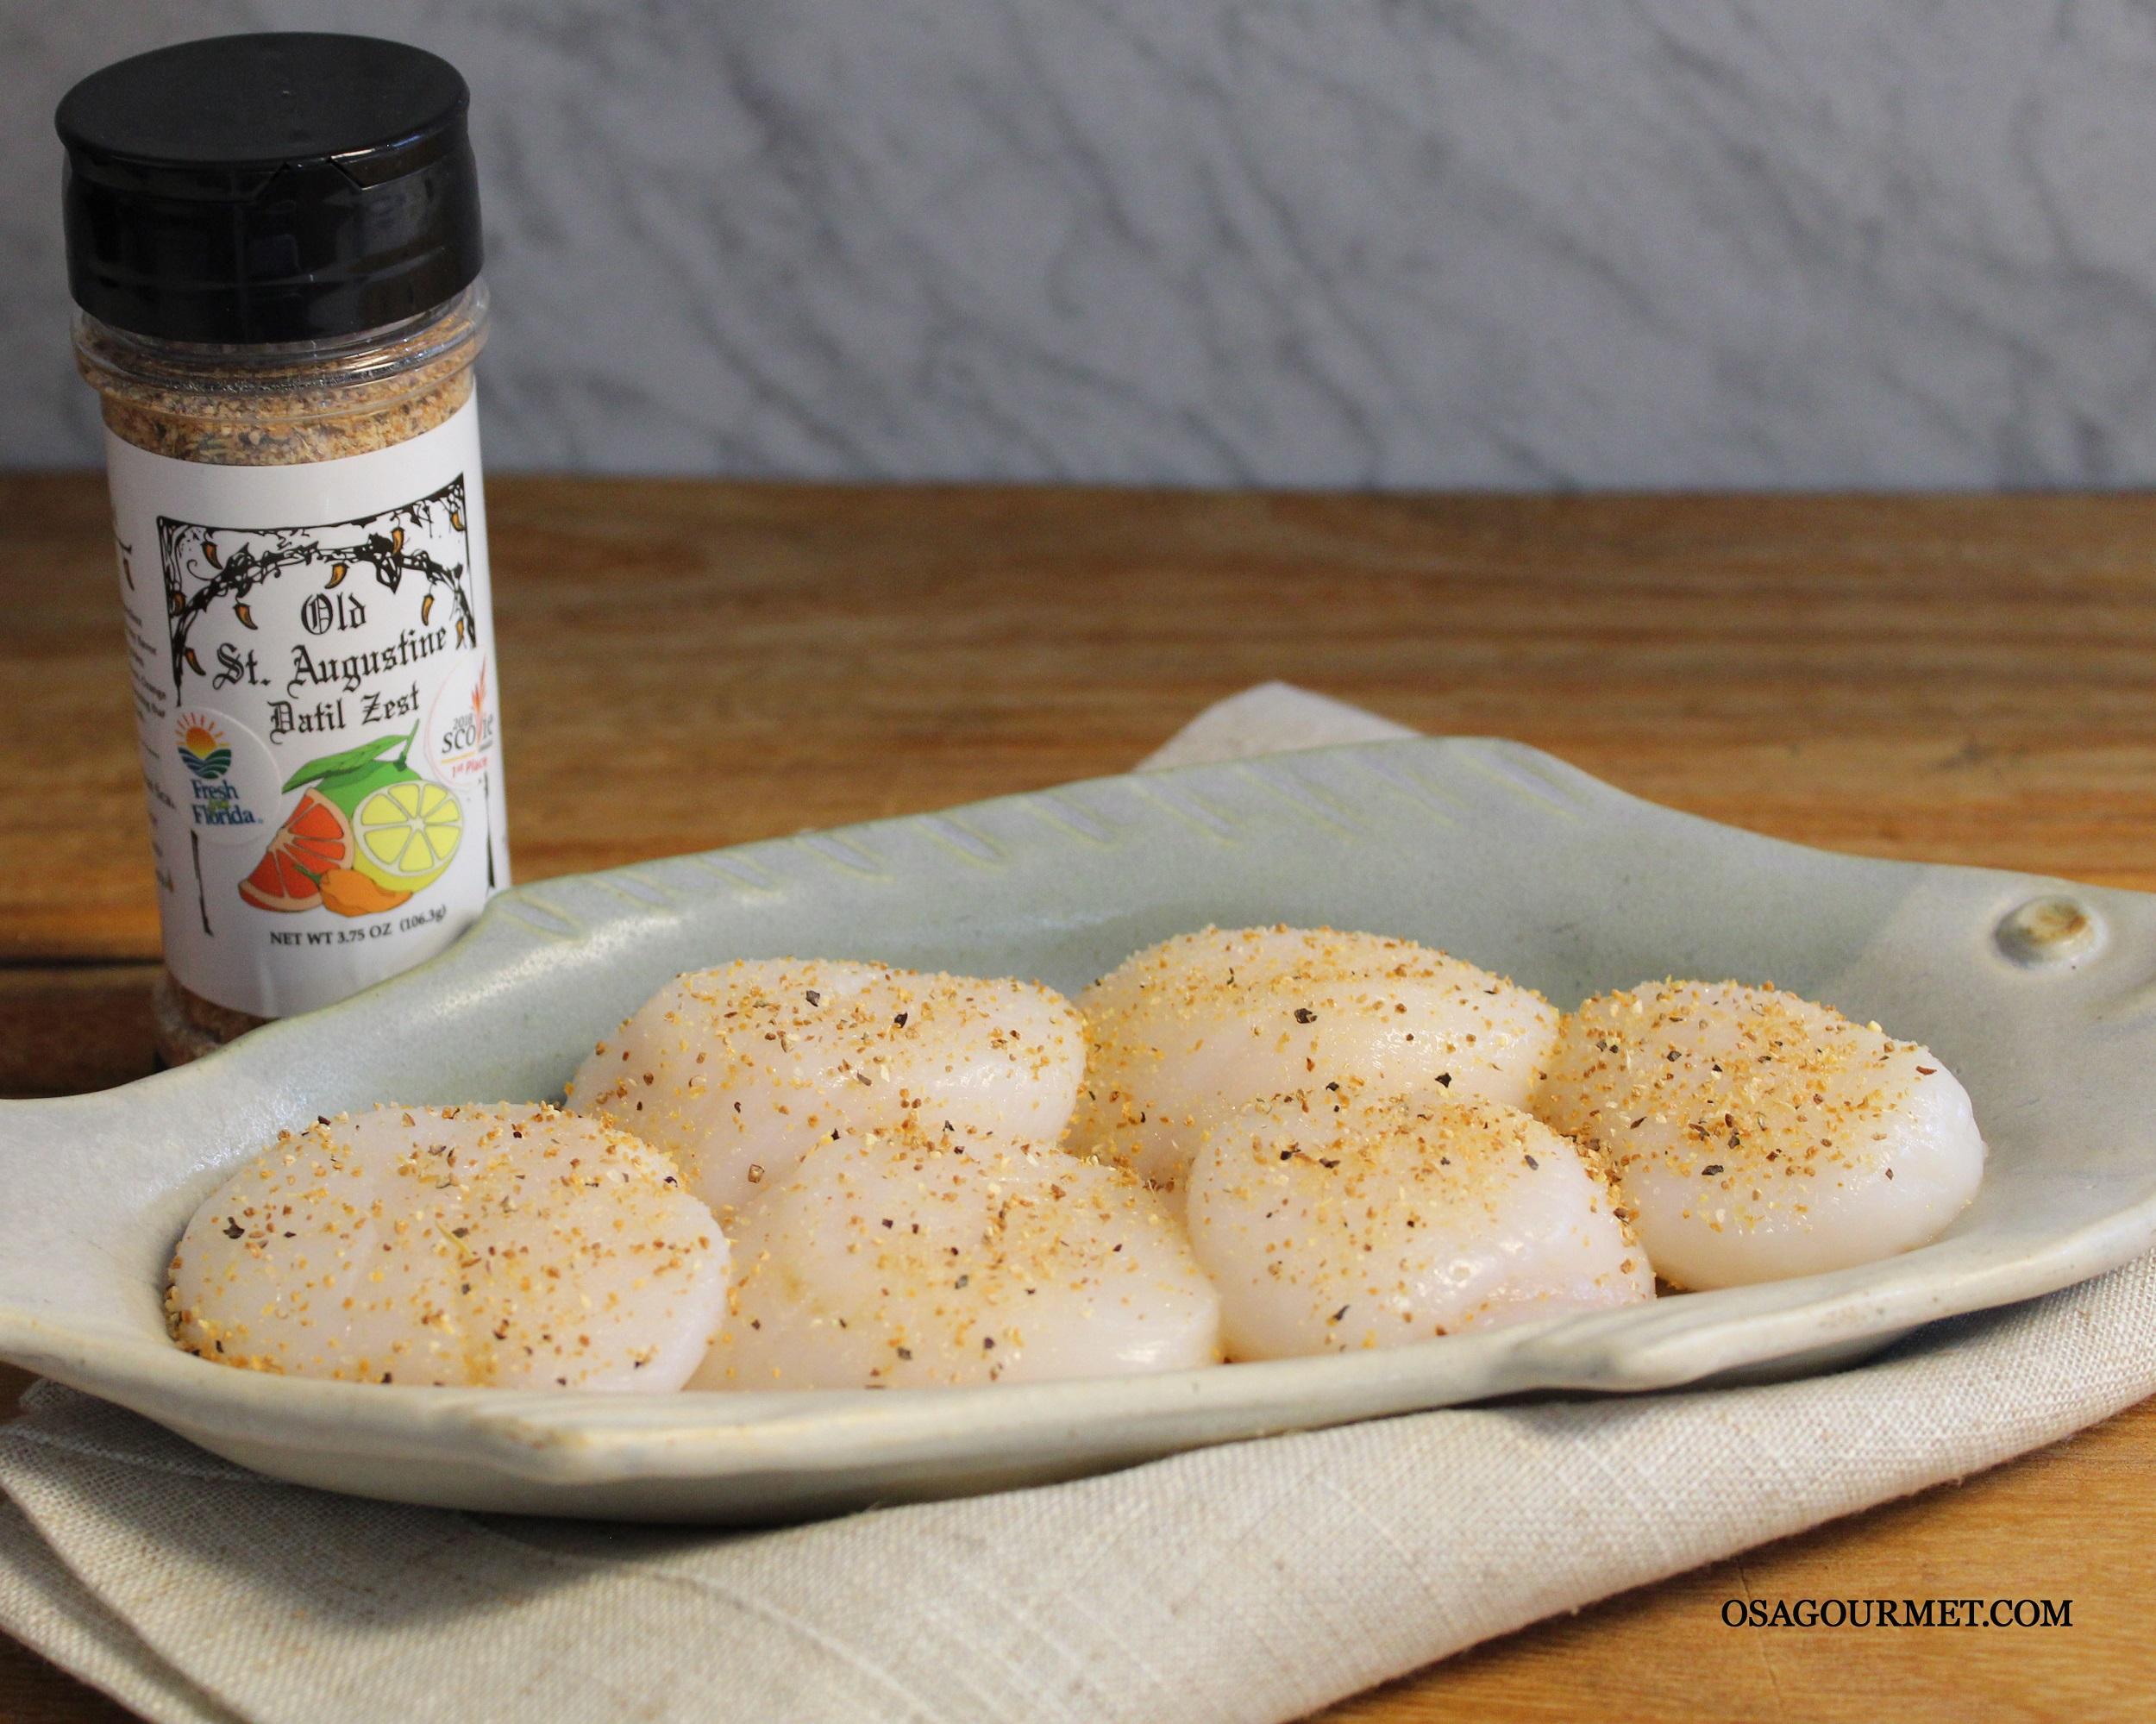 Sea Scallops seasoned with Datil Zest